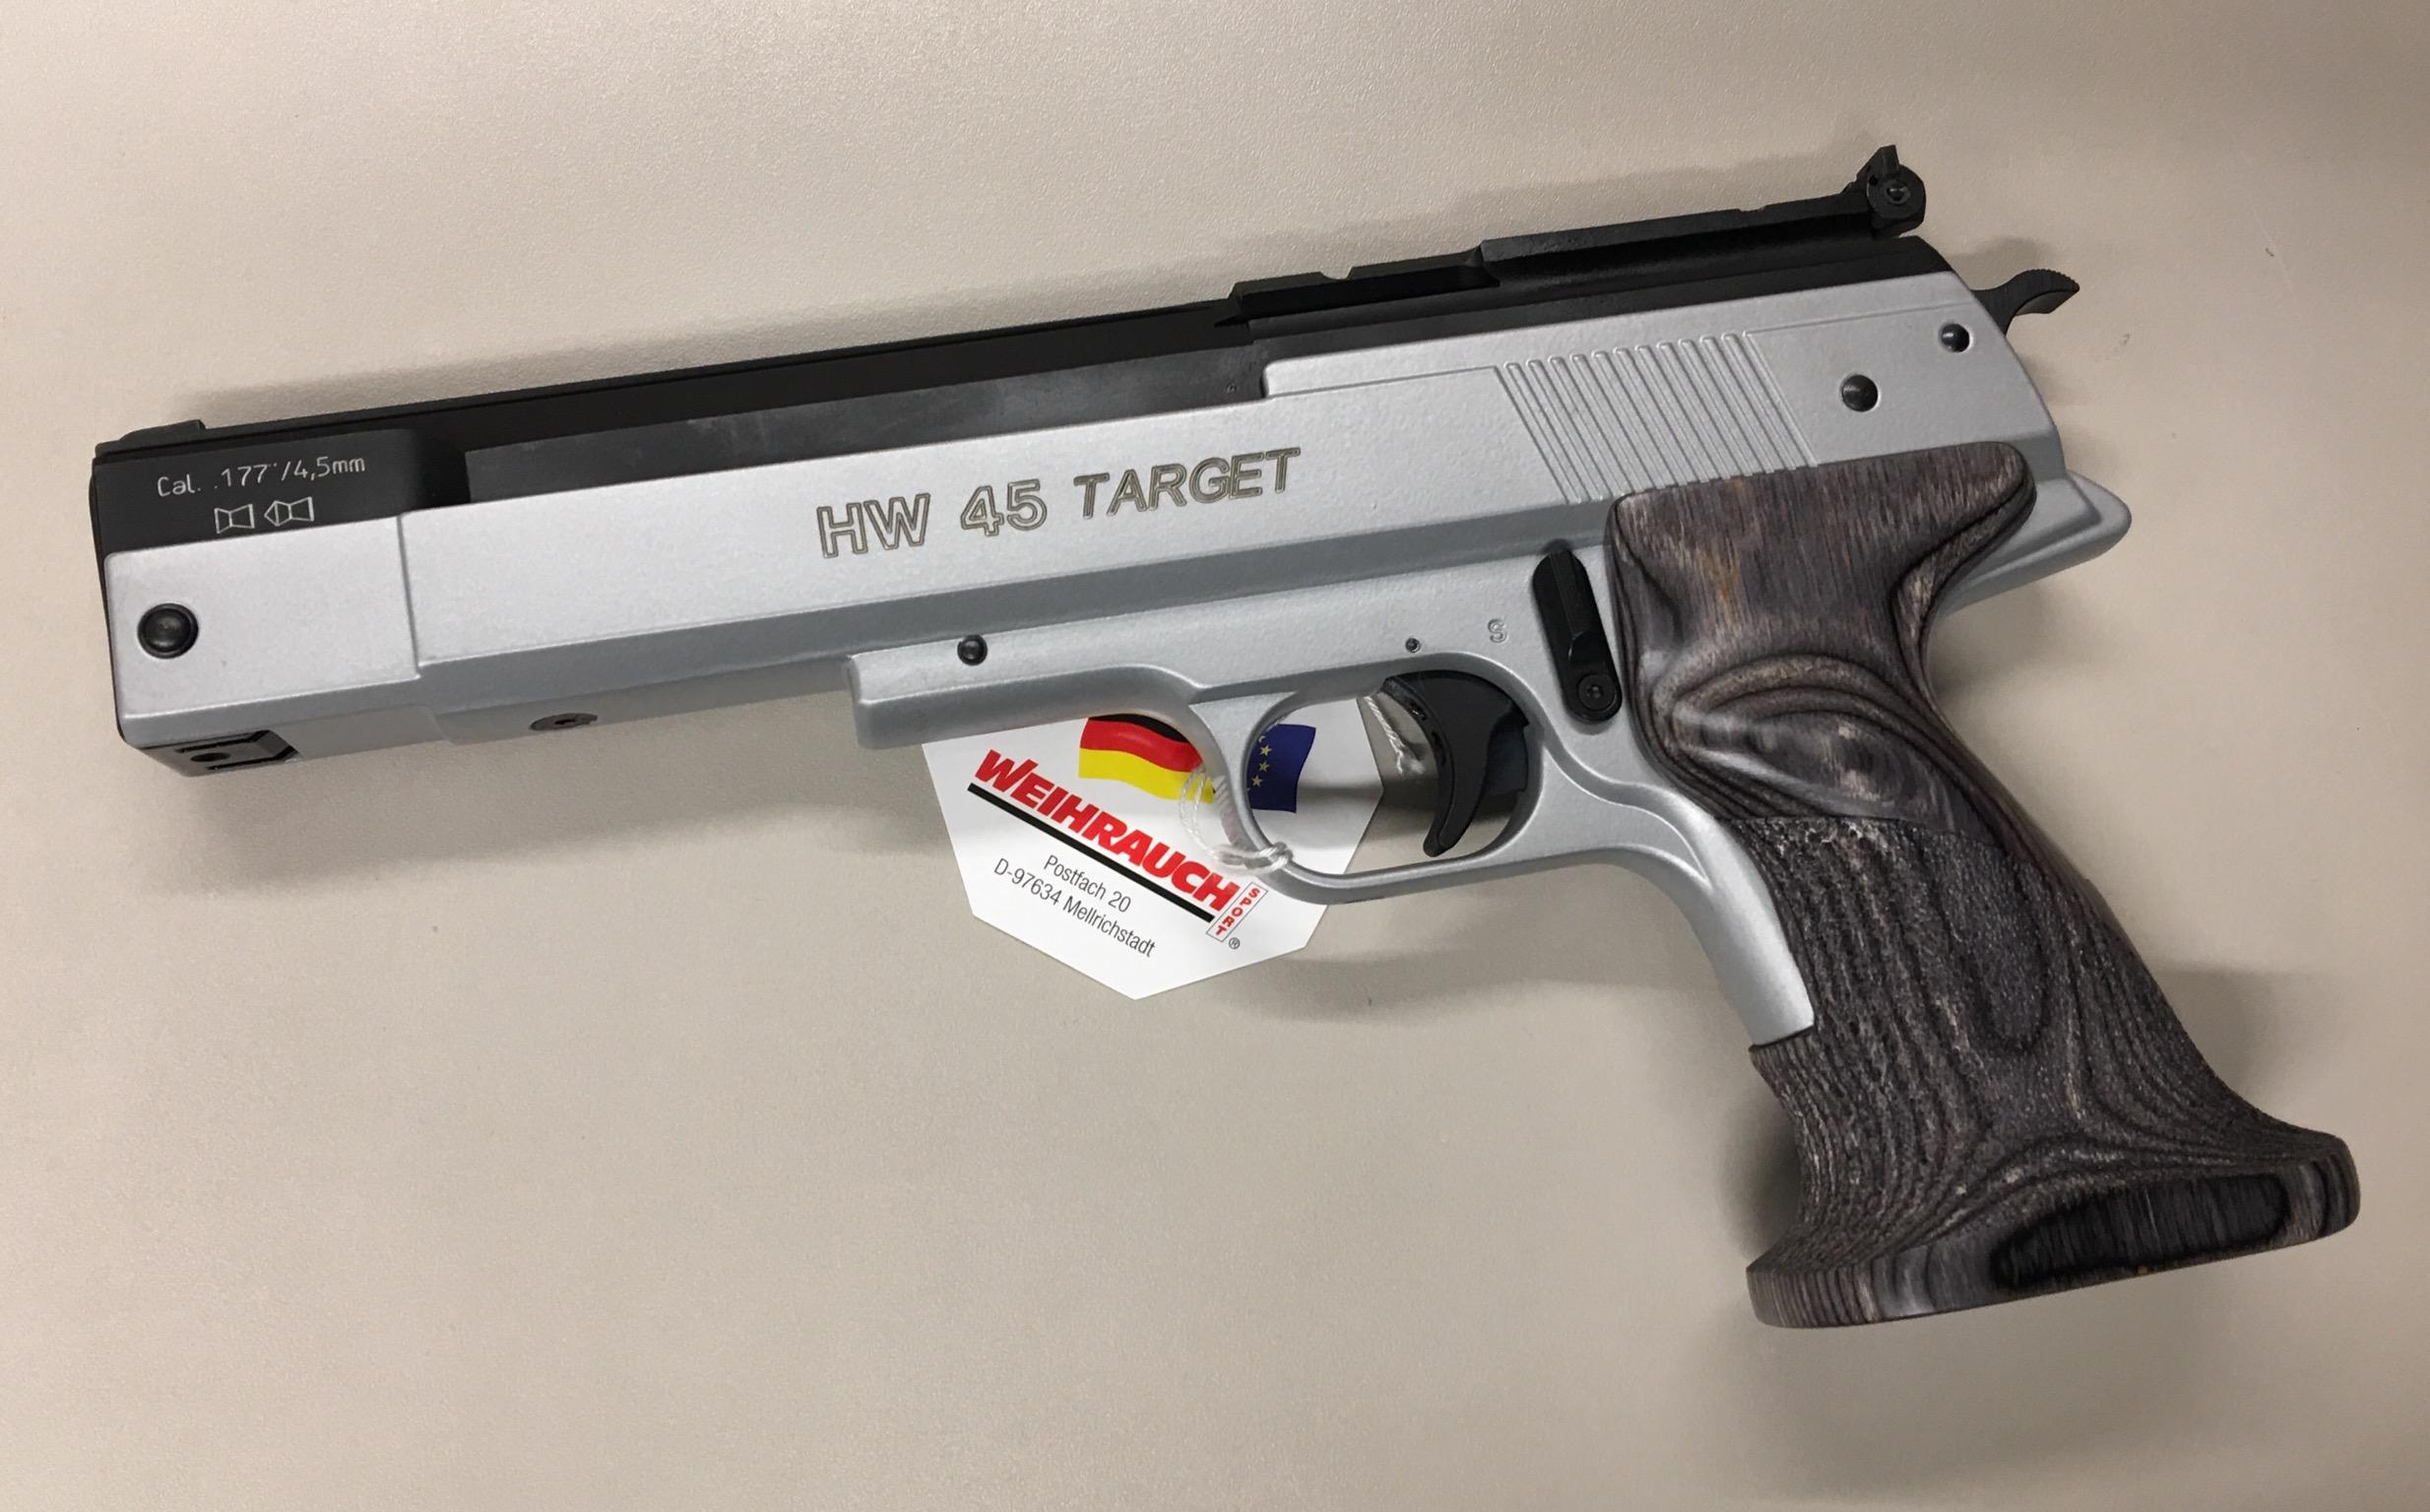 HW 45 Silver Star Target Kaliber 4,5mm